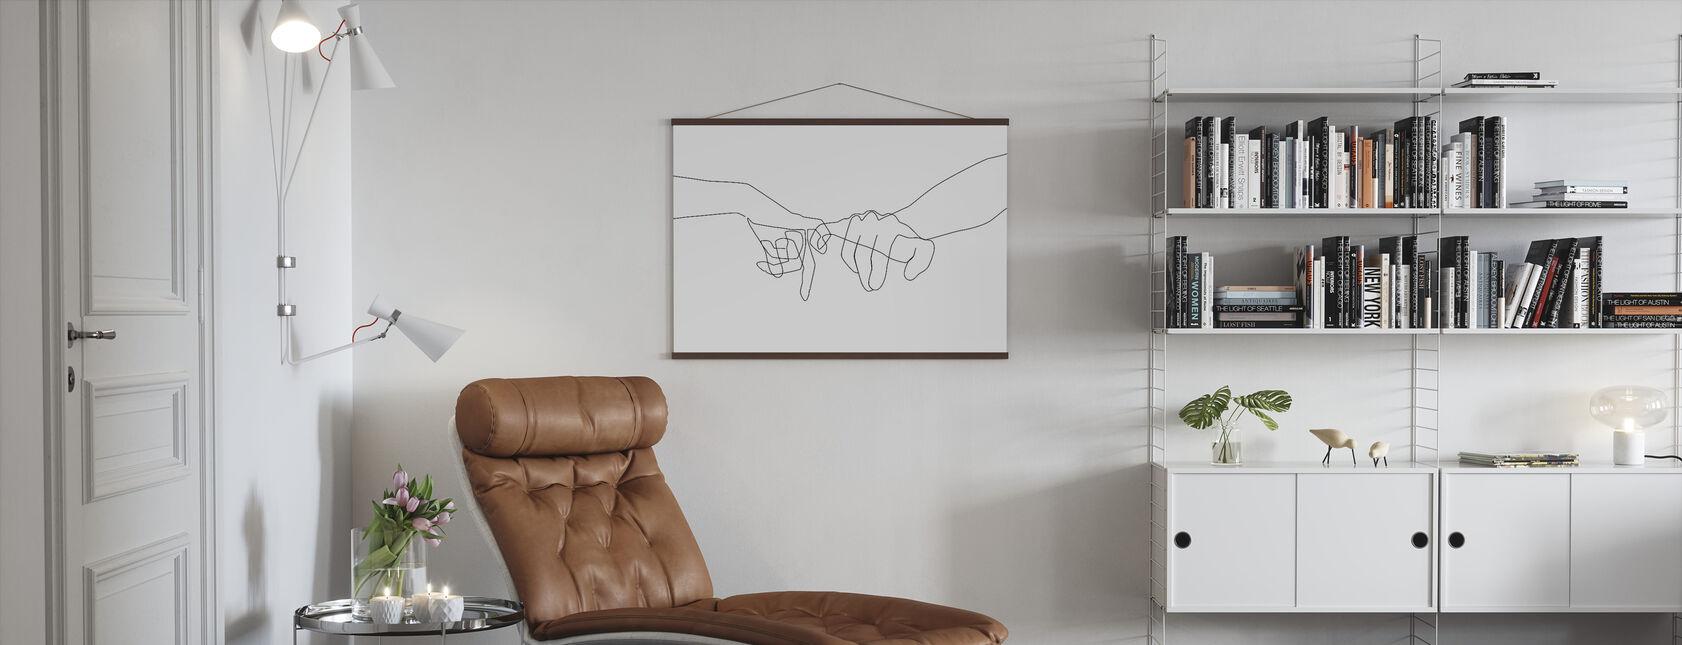 Pinky svär - Poster - Vardagsrum